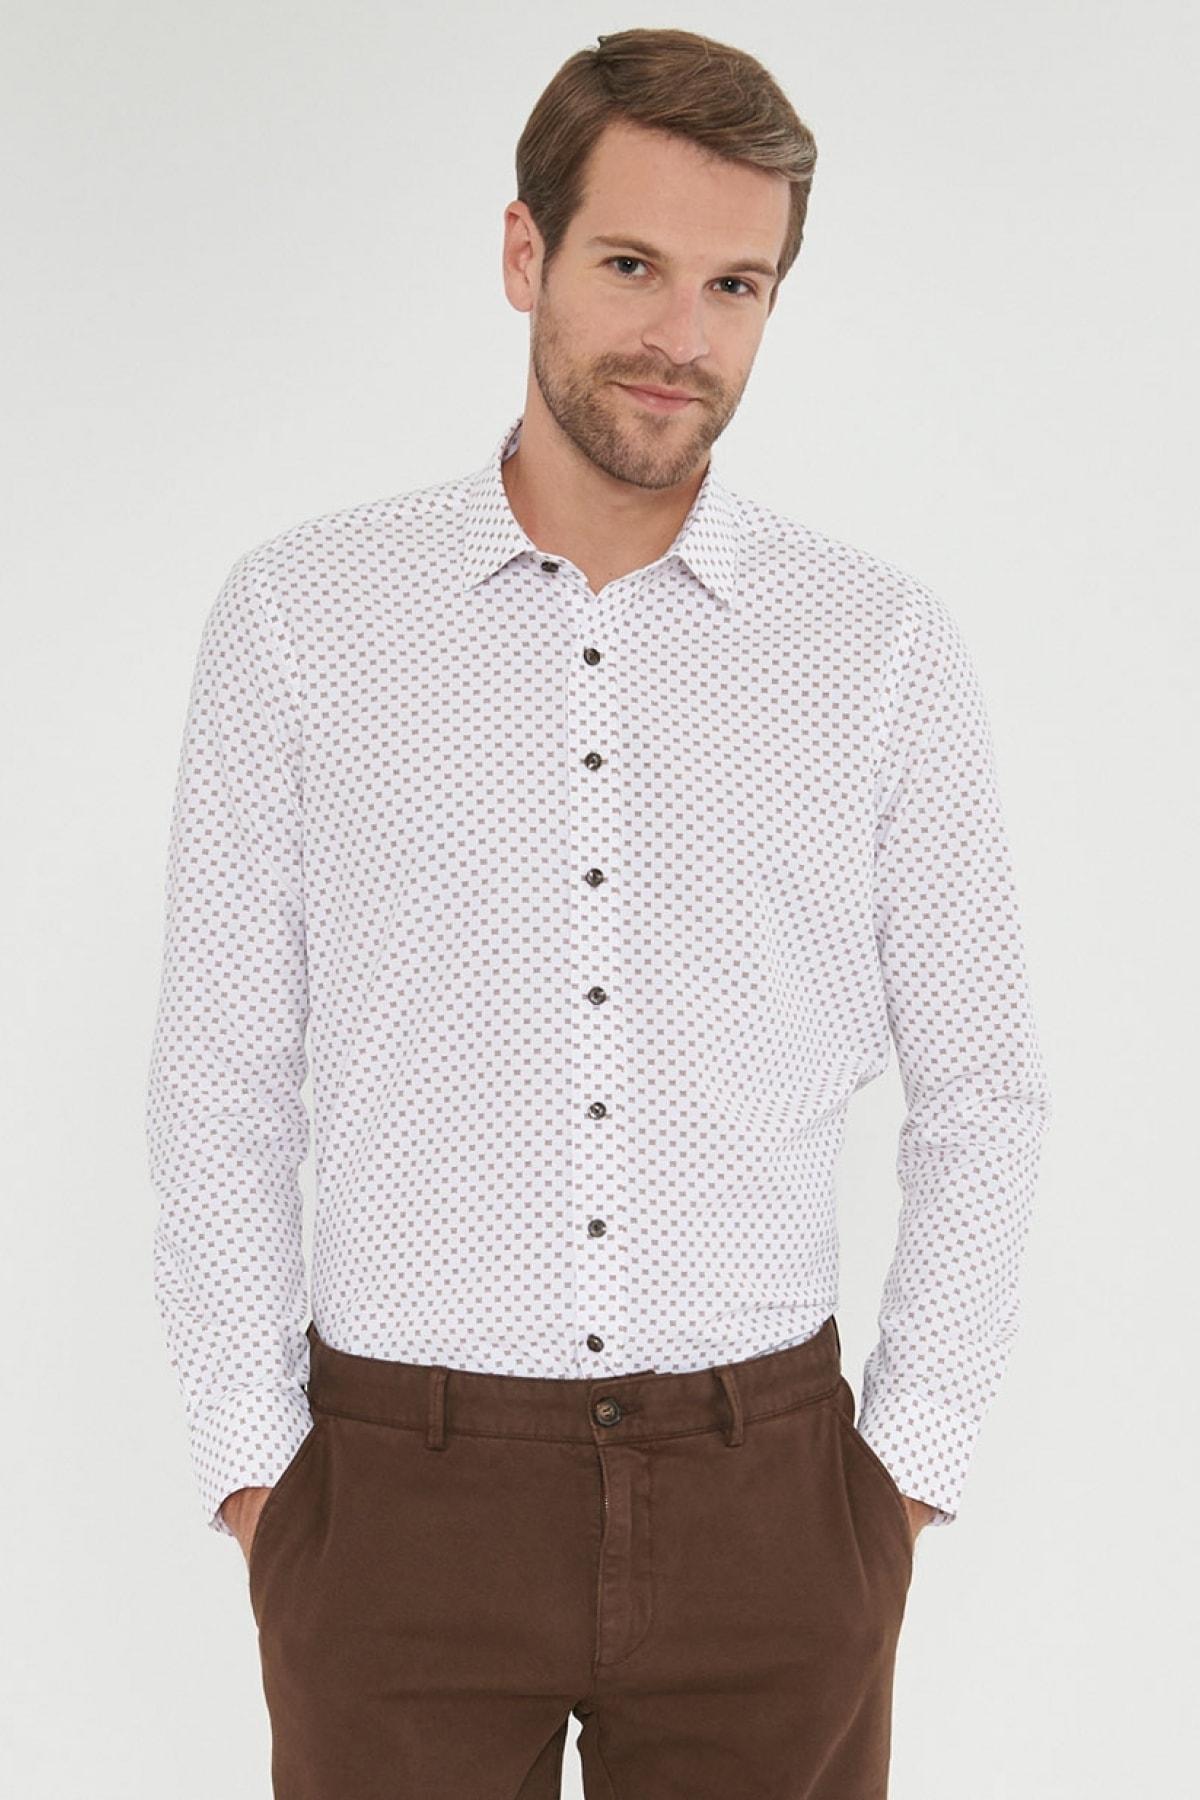 Erkek Kahverengi Tailored Slim Fit Baskılı Gömlek